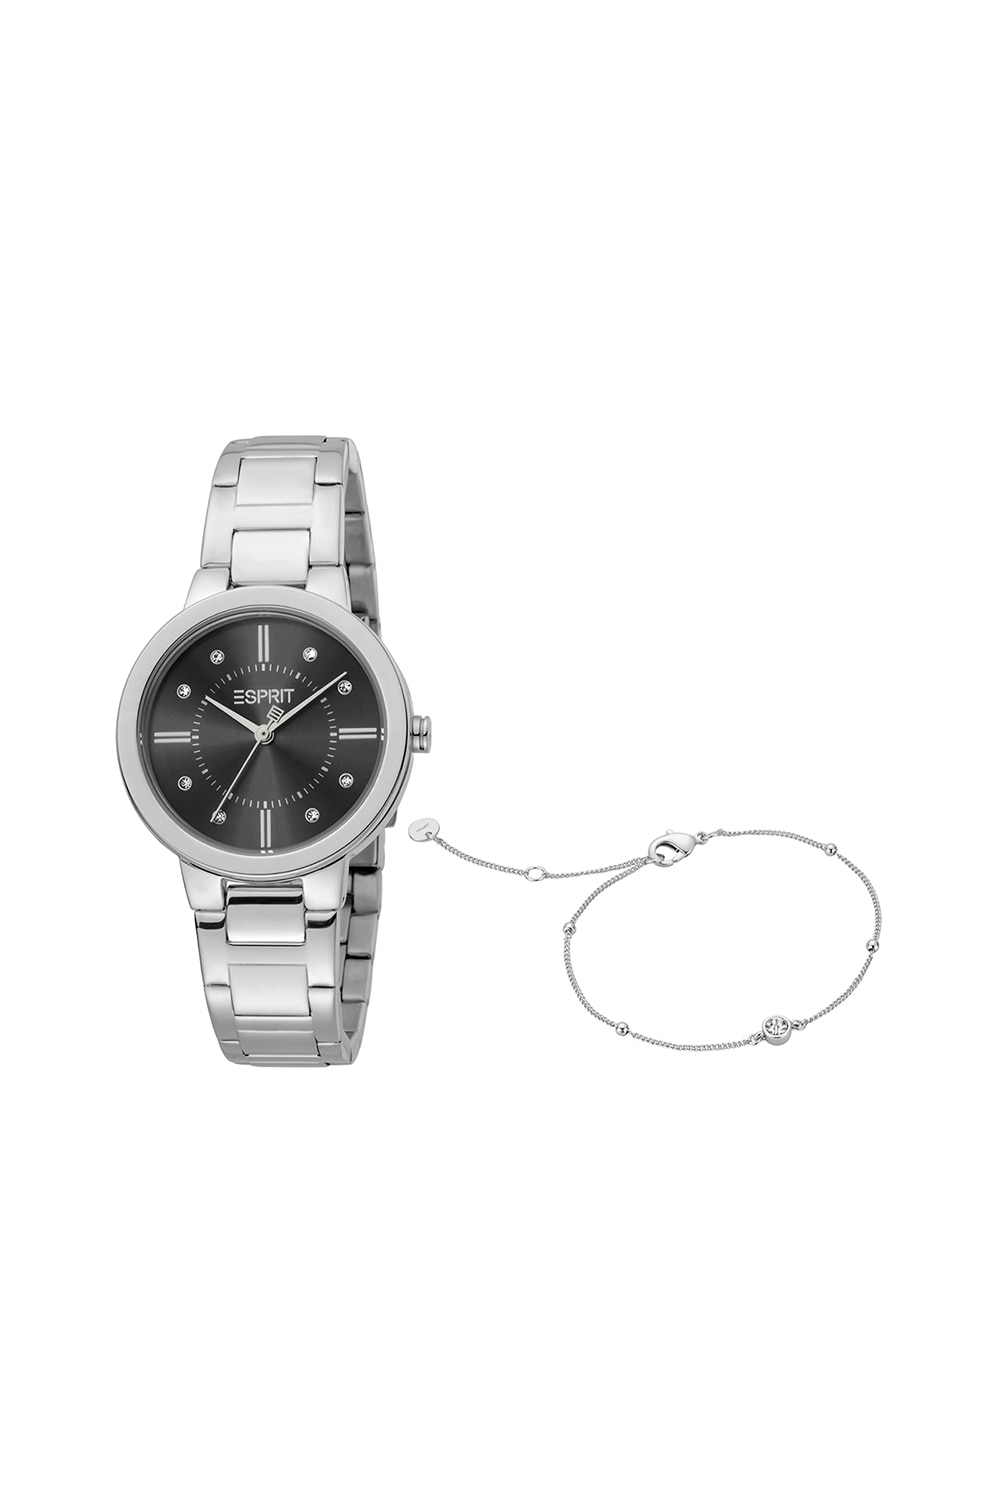 Fotografie Esprit, Set de ceas de otel inoxidabil si bratara, Argintiu